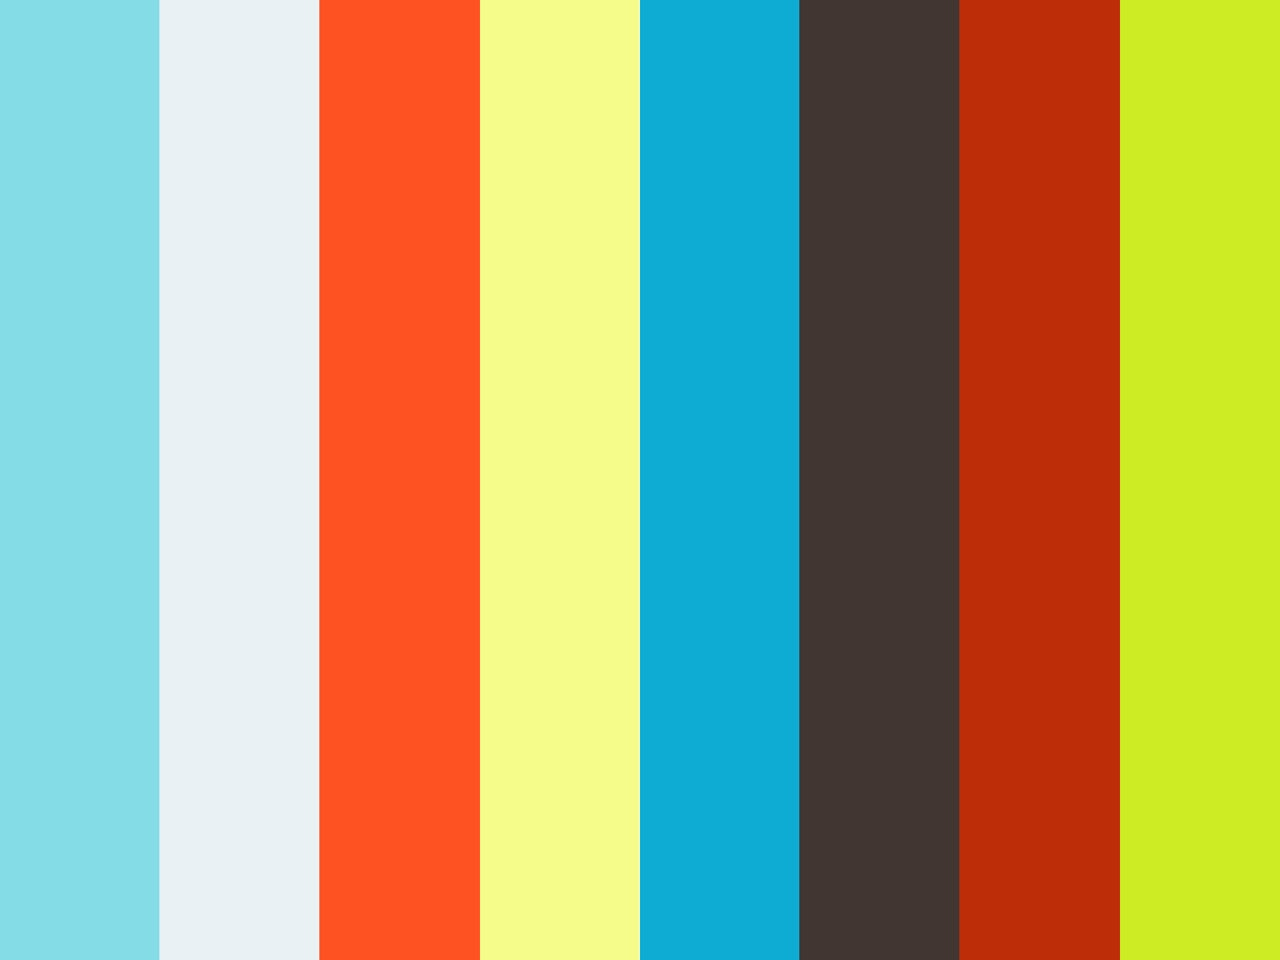 Beta - Tetris (7C), The Roaches.